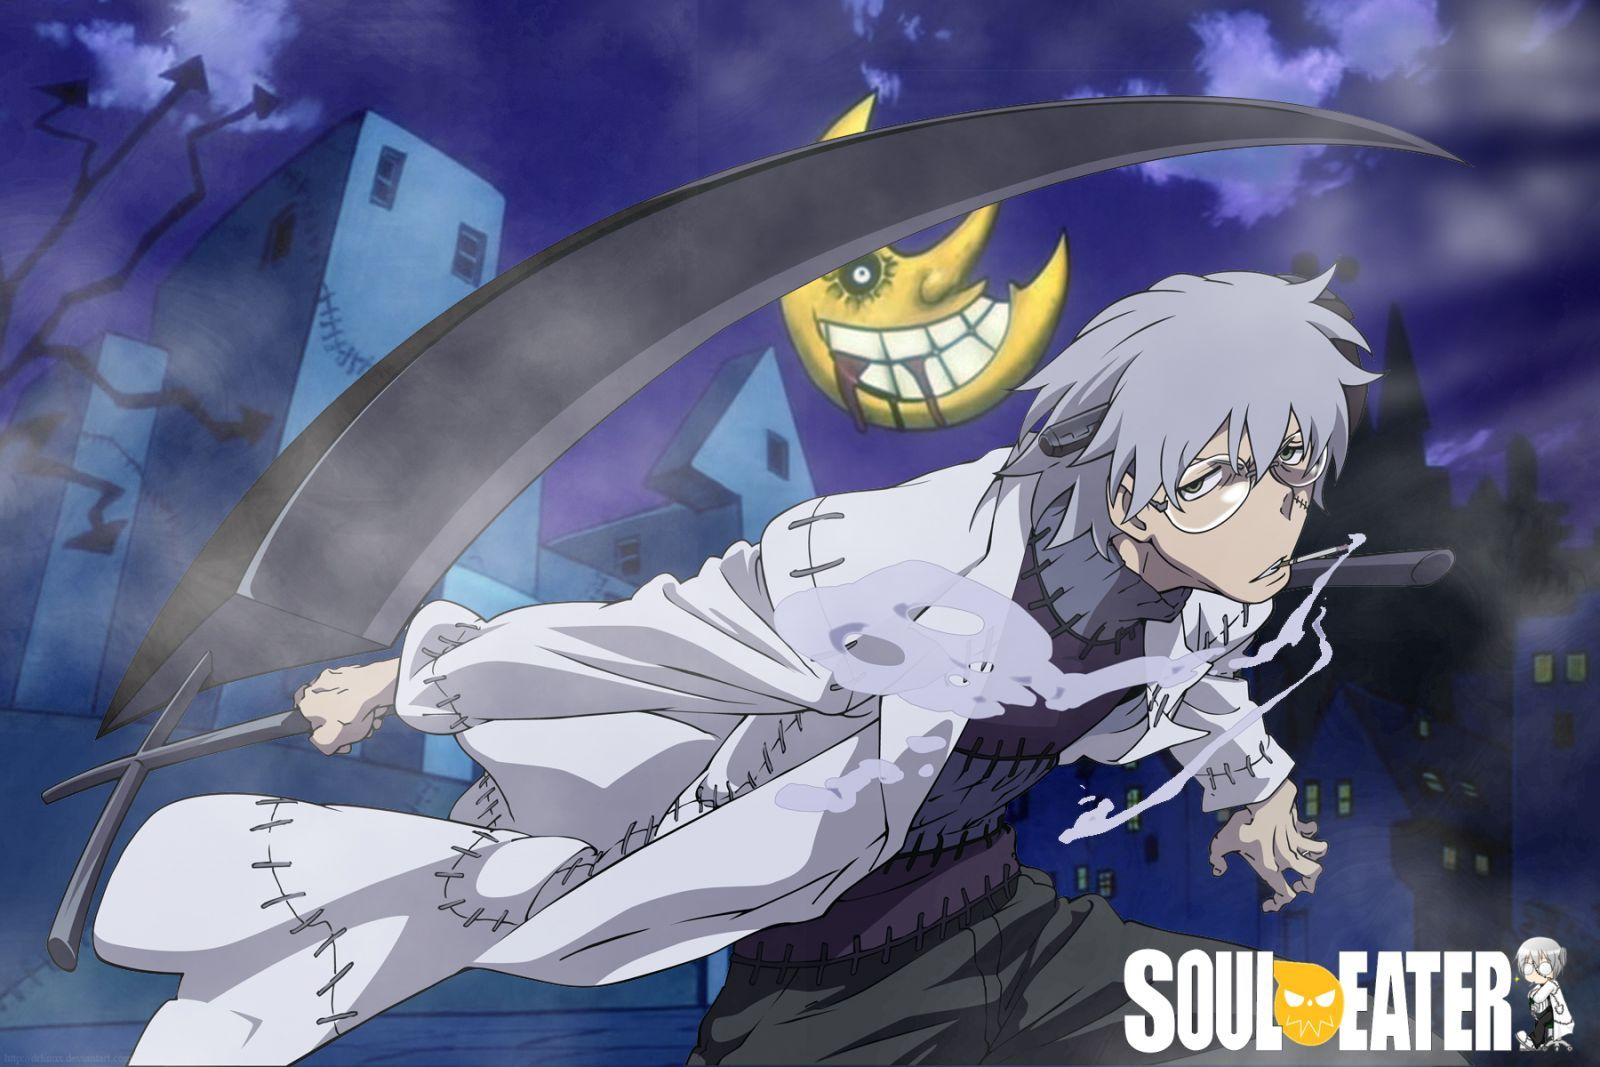 Qué Personaje Eres De Soul Eater Comedor De Almas Dibujos De Anime Soul Eater